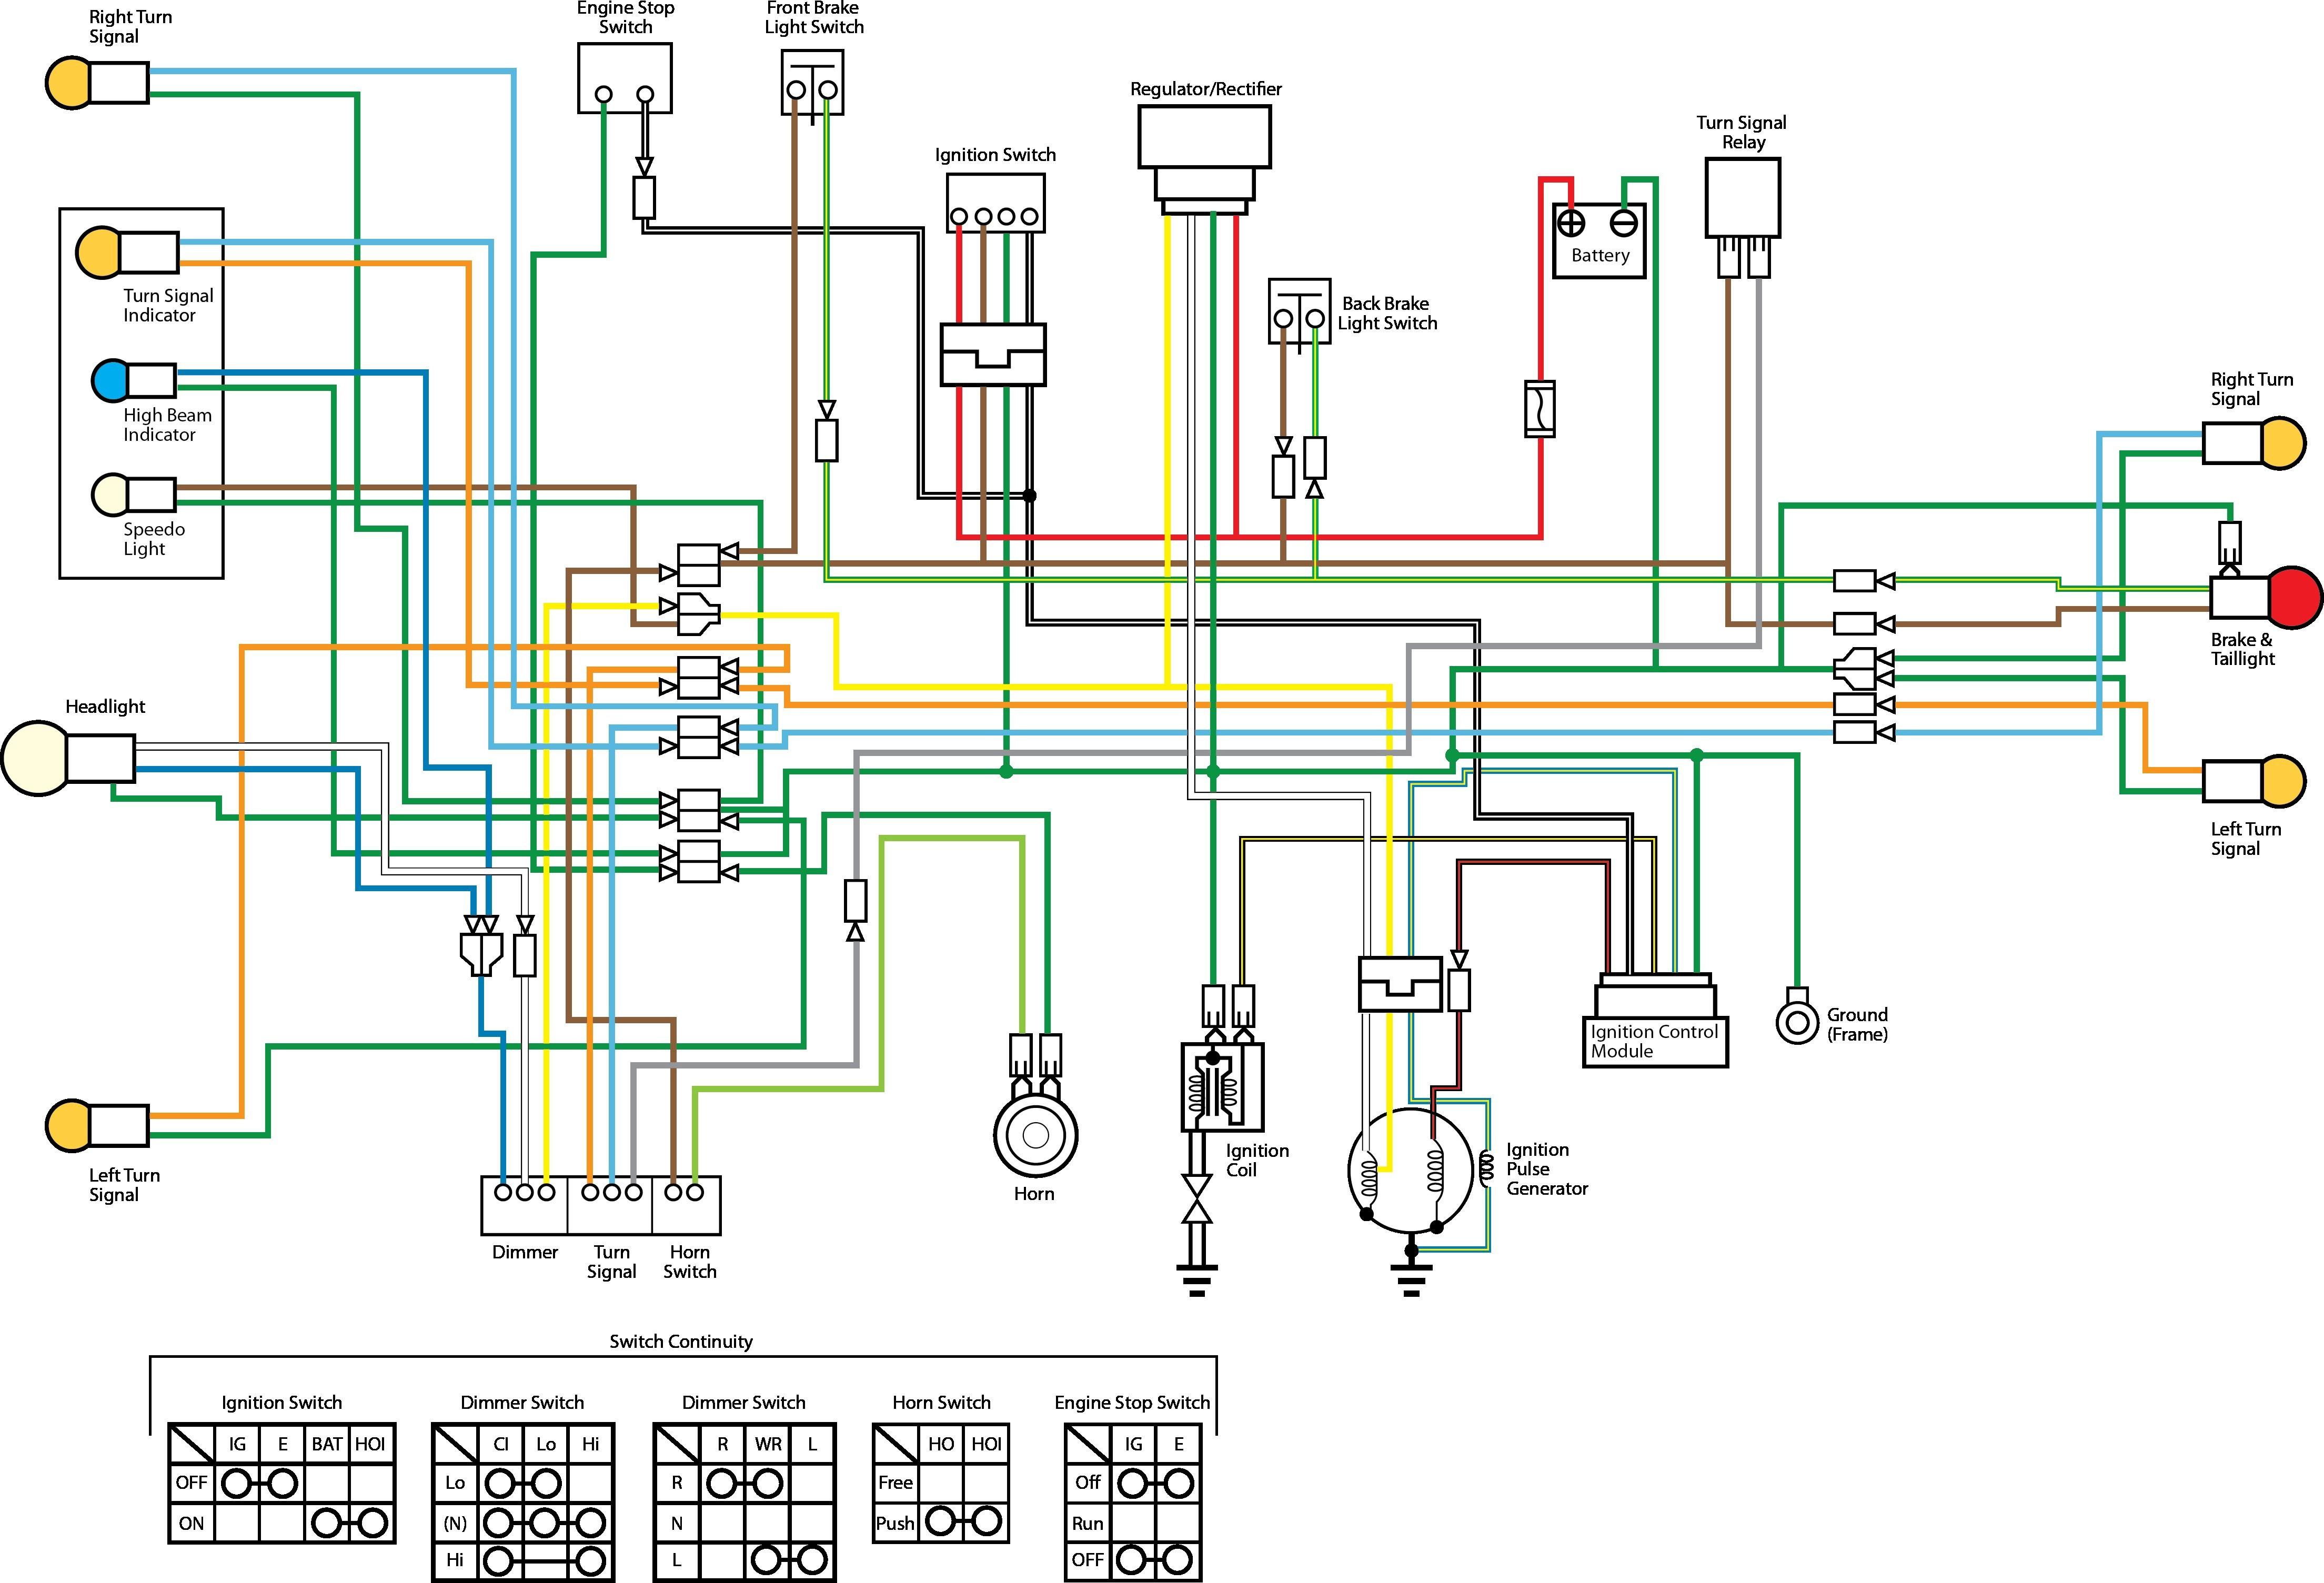 Dune Buggy Engine Schematics Drawings Wiring Diagram Datasource Dune Buggy Engine Parts List Schematics Drawings